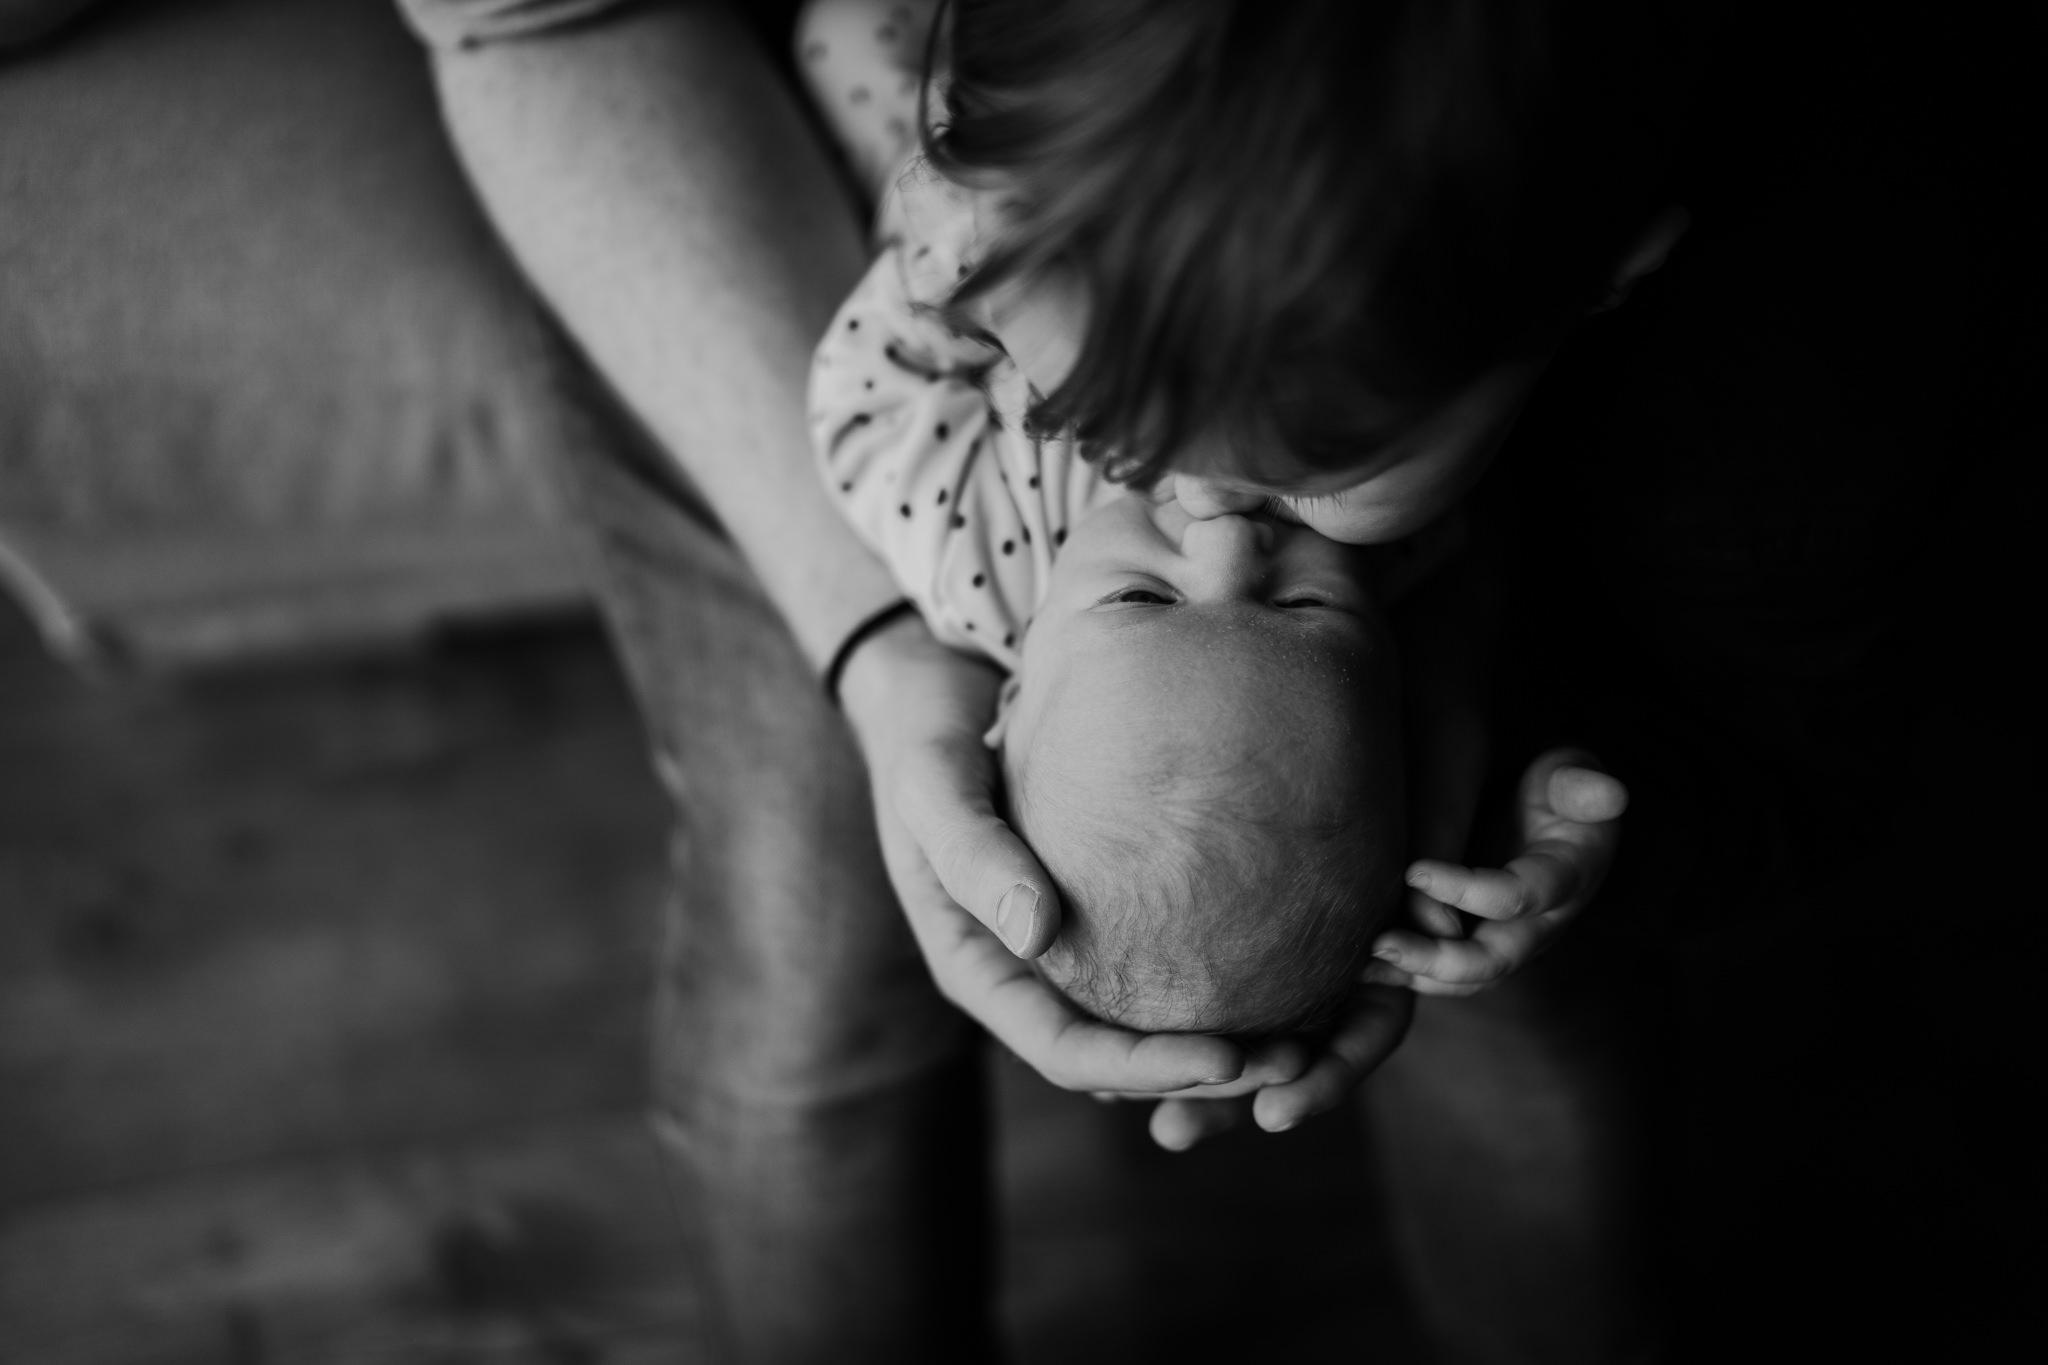 newborn-photographer-belfast-the-snug-sessions-Nora-45.jpg